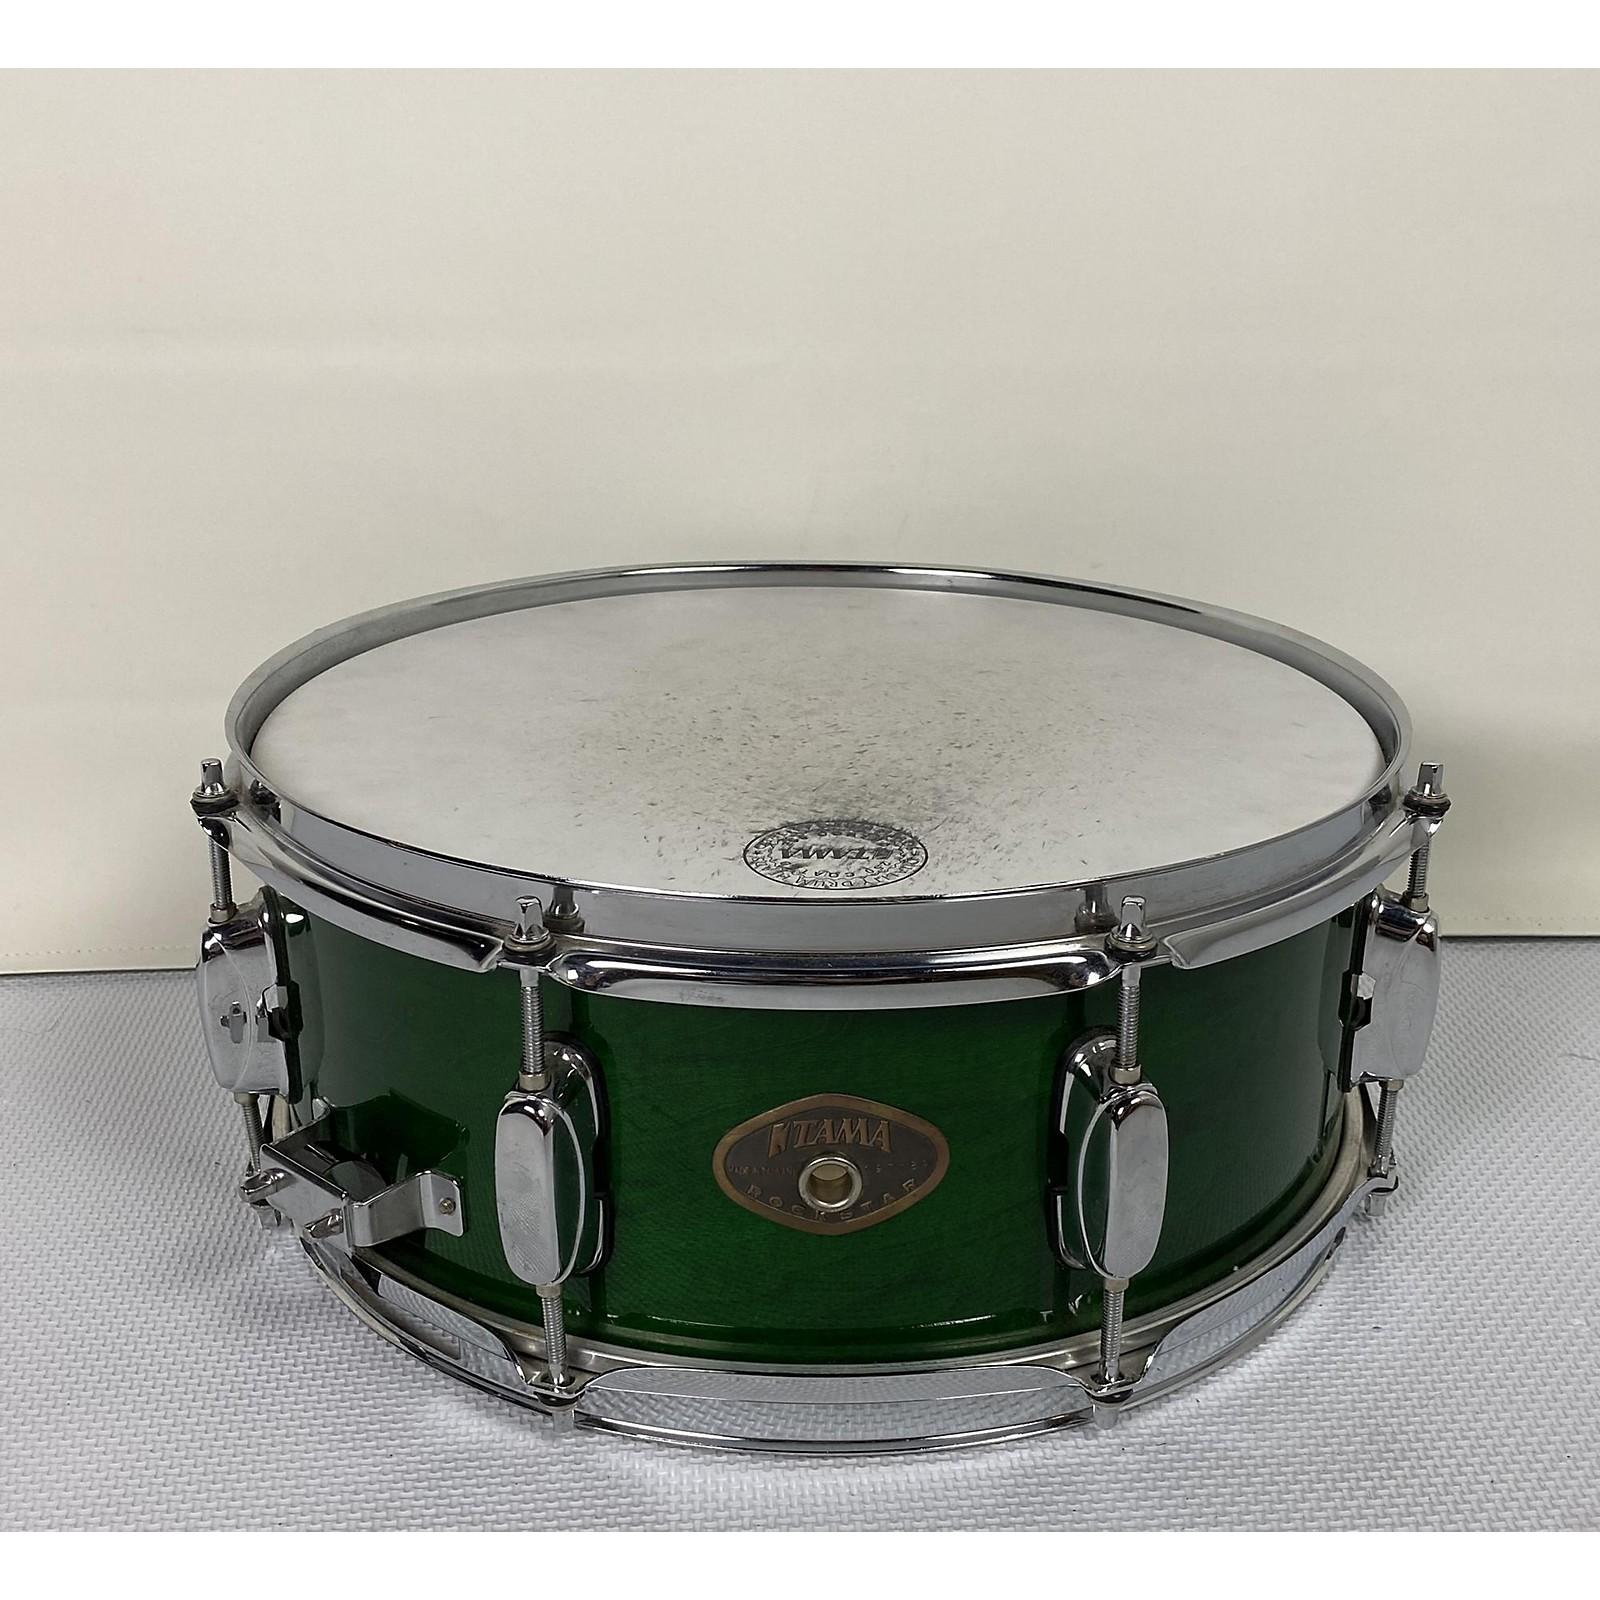 TAMA 14X5.5 Rockstar Series Snare Drum